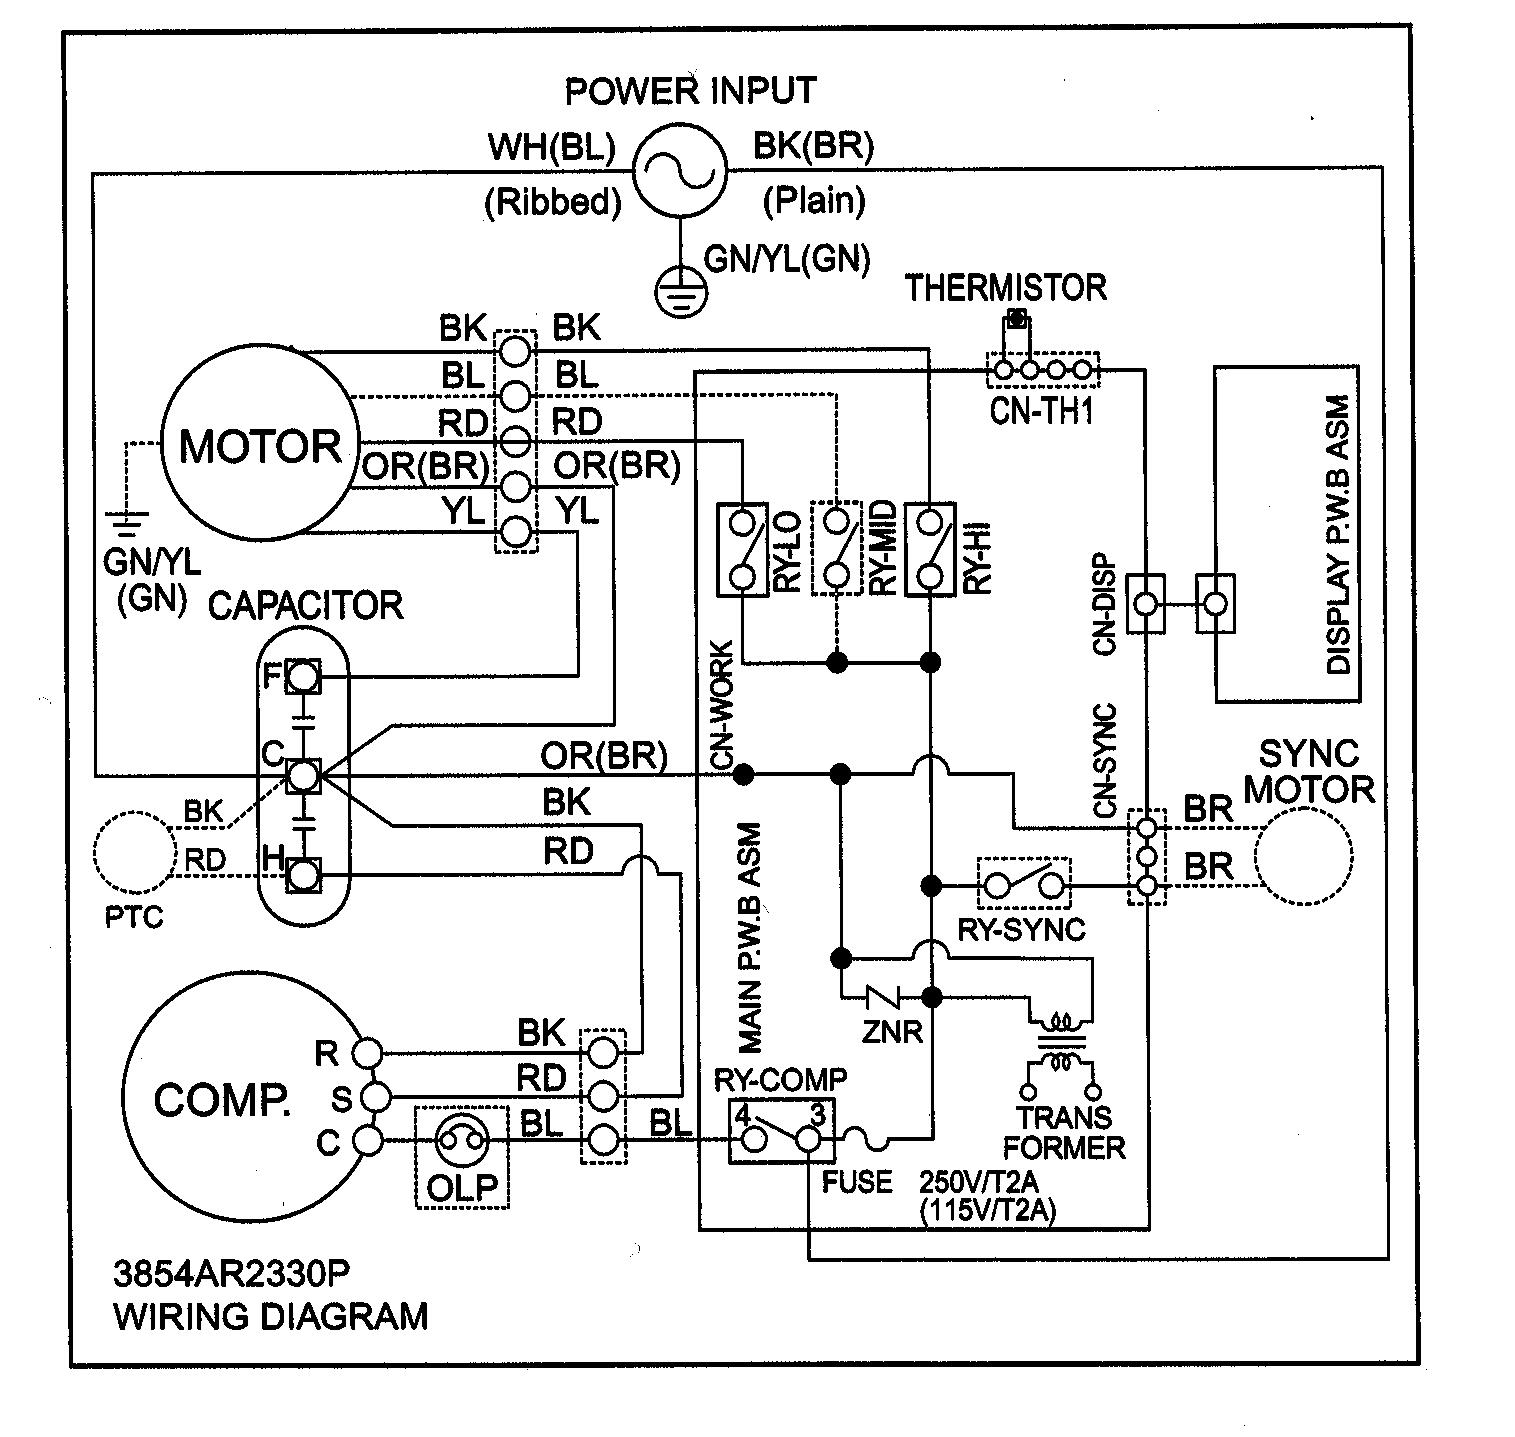 Whirlpool 3 1 cf mini refrigerator 3 1 cu ft 2 door compact waeco fridge circuit diagram wiring diagrams wiring asfbconference2016 Images